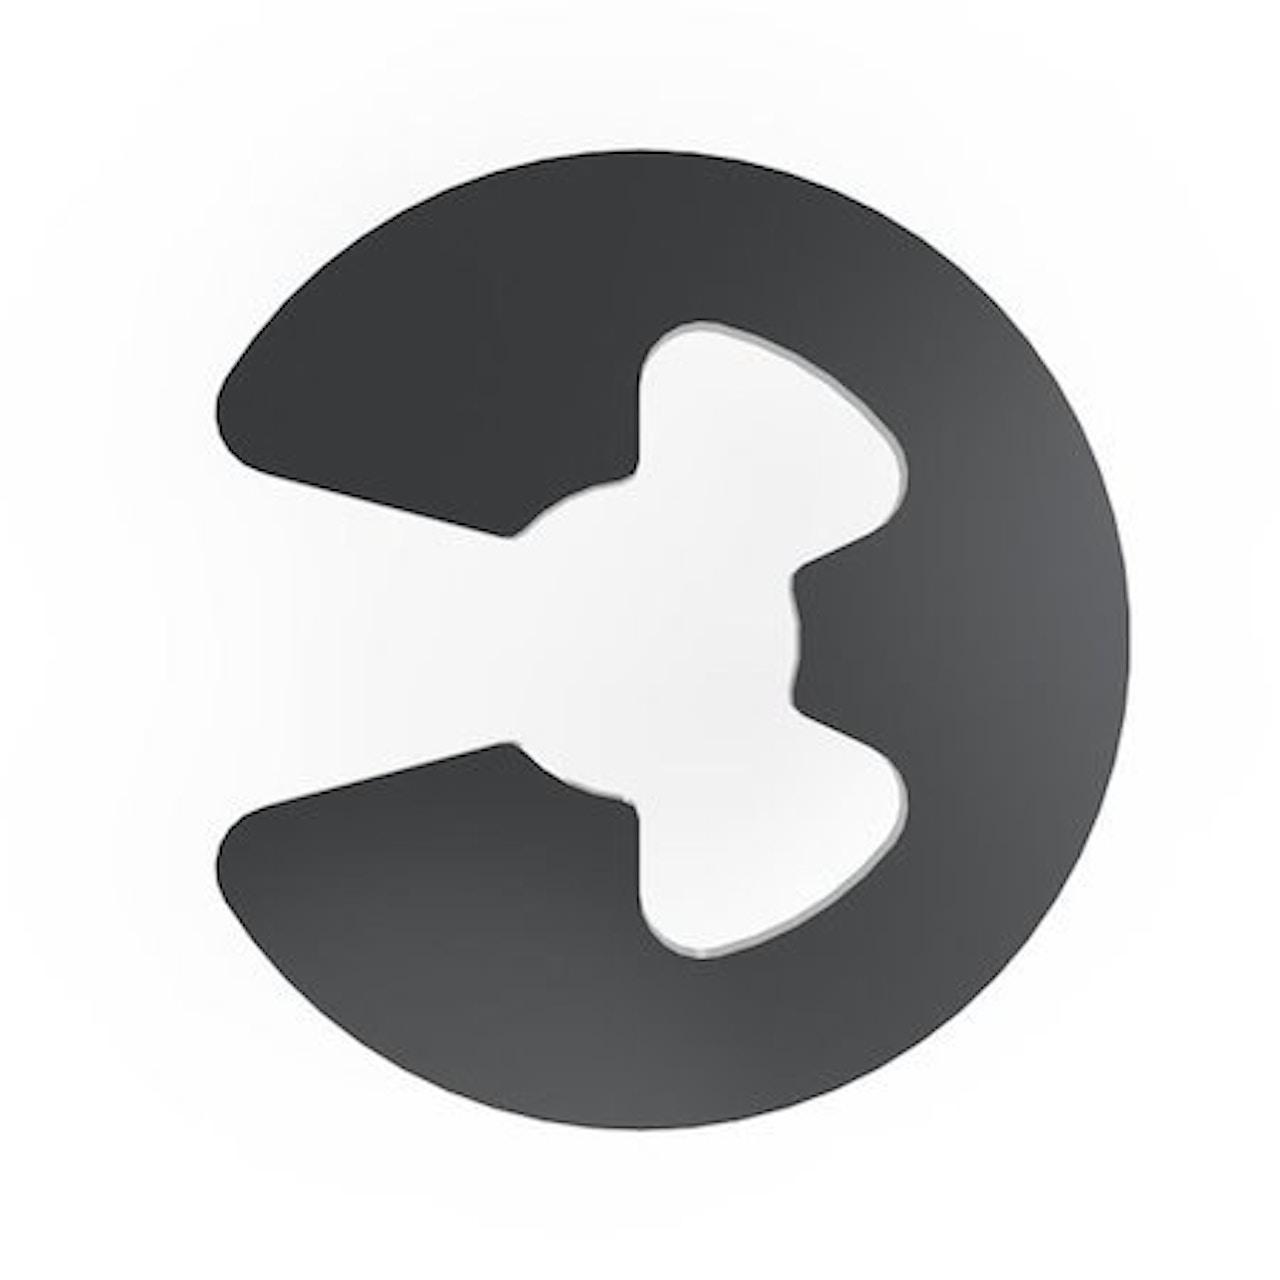 e-series retaining ring